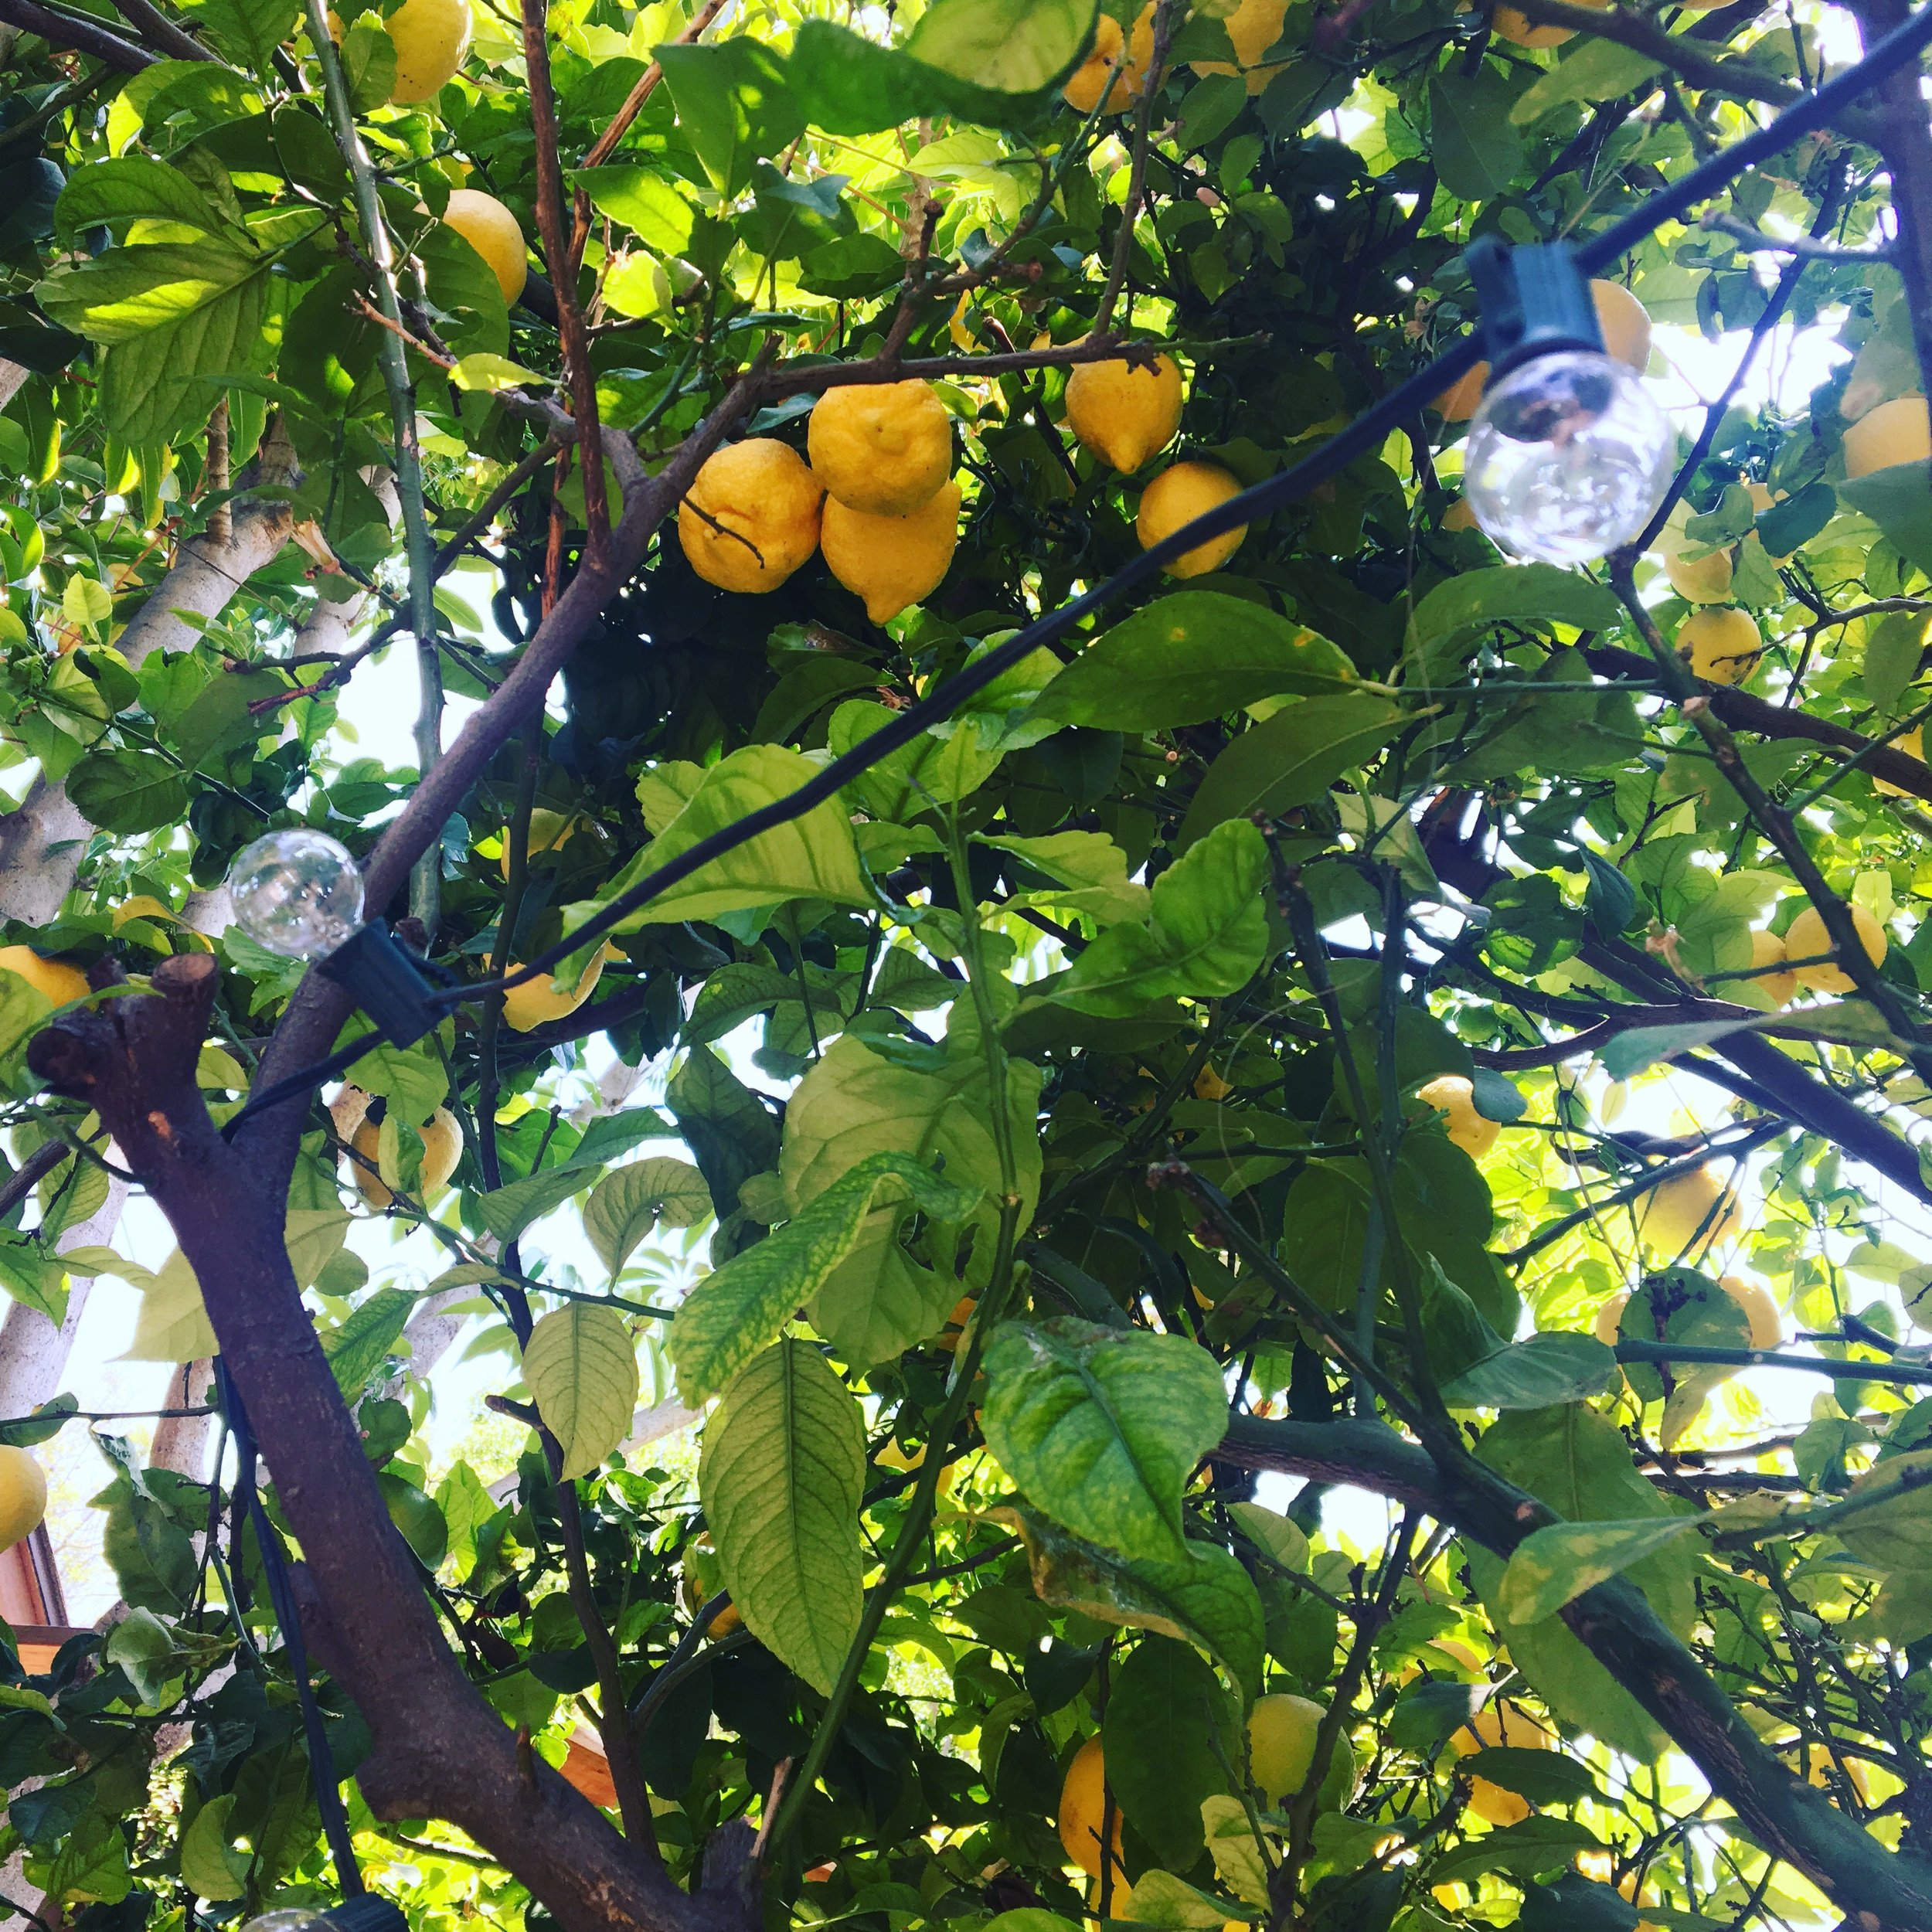 Seriously, these lemons were like softballs.